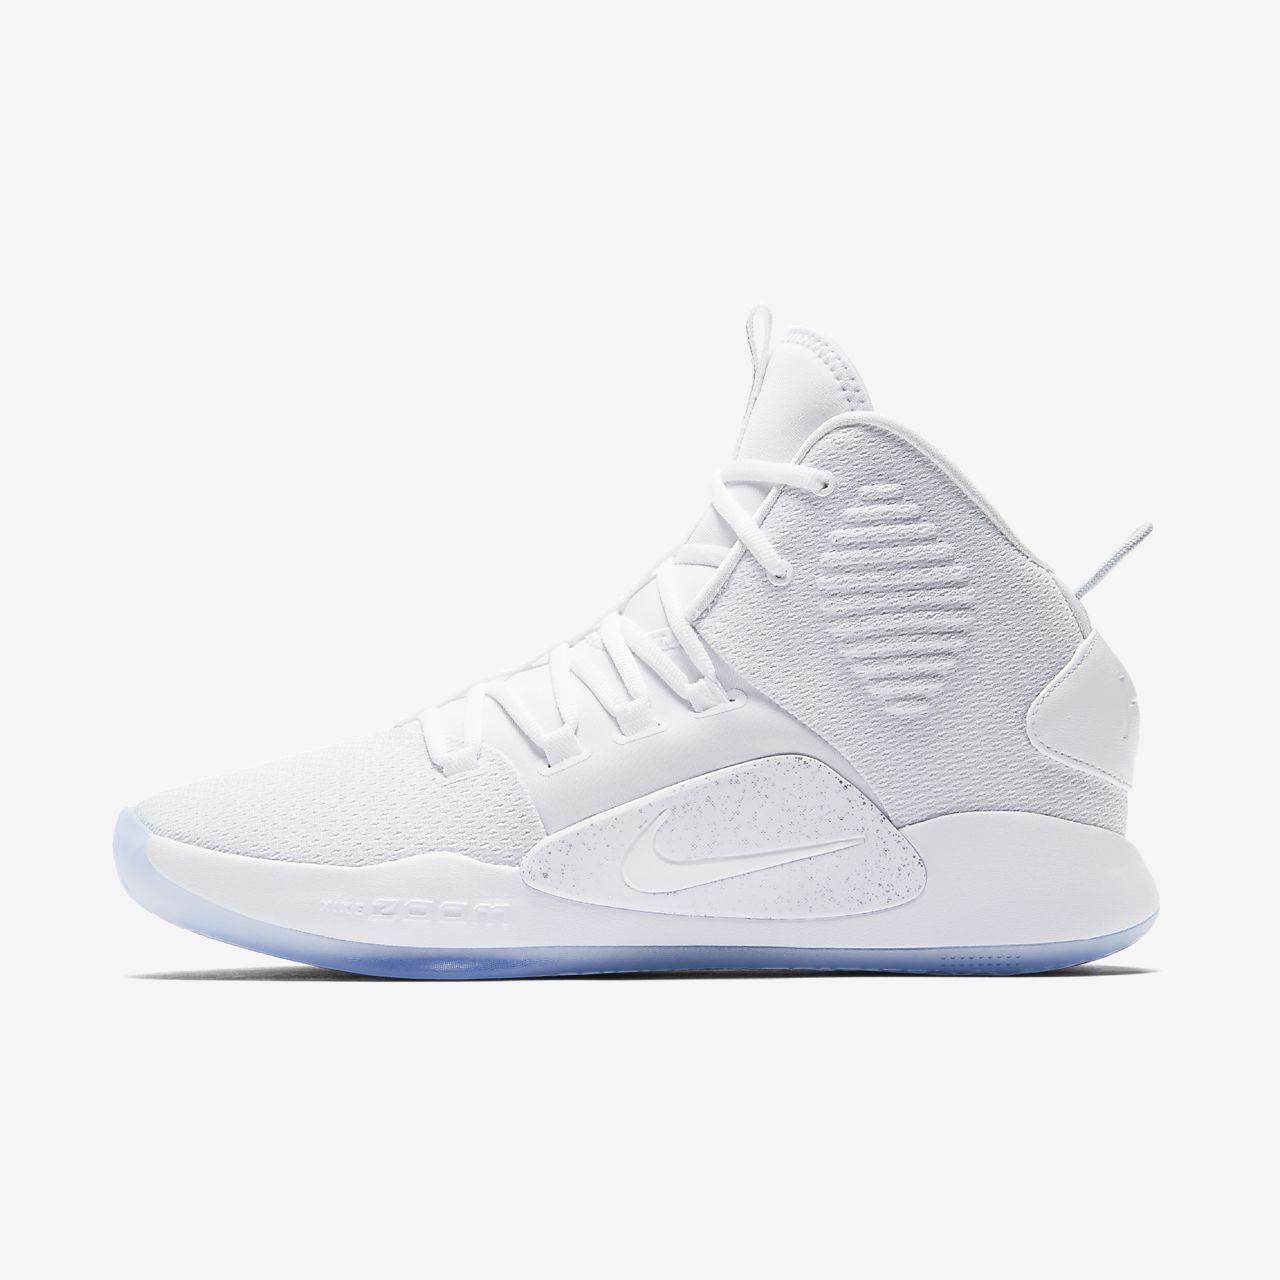 Nike Hyperdunk X Basketball Shoe